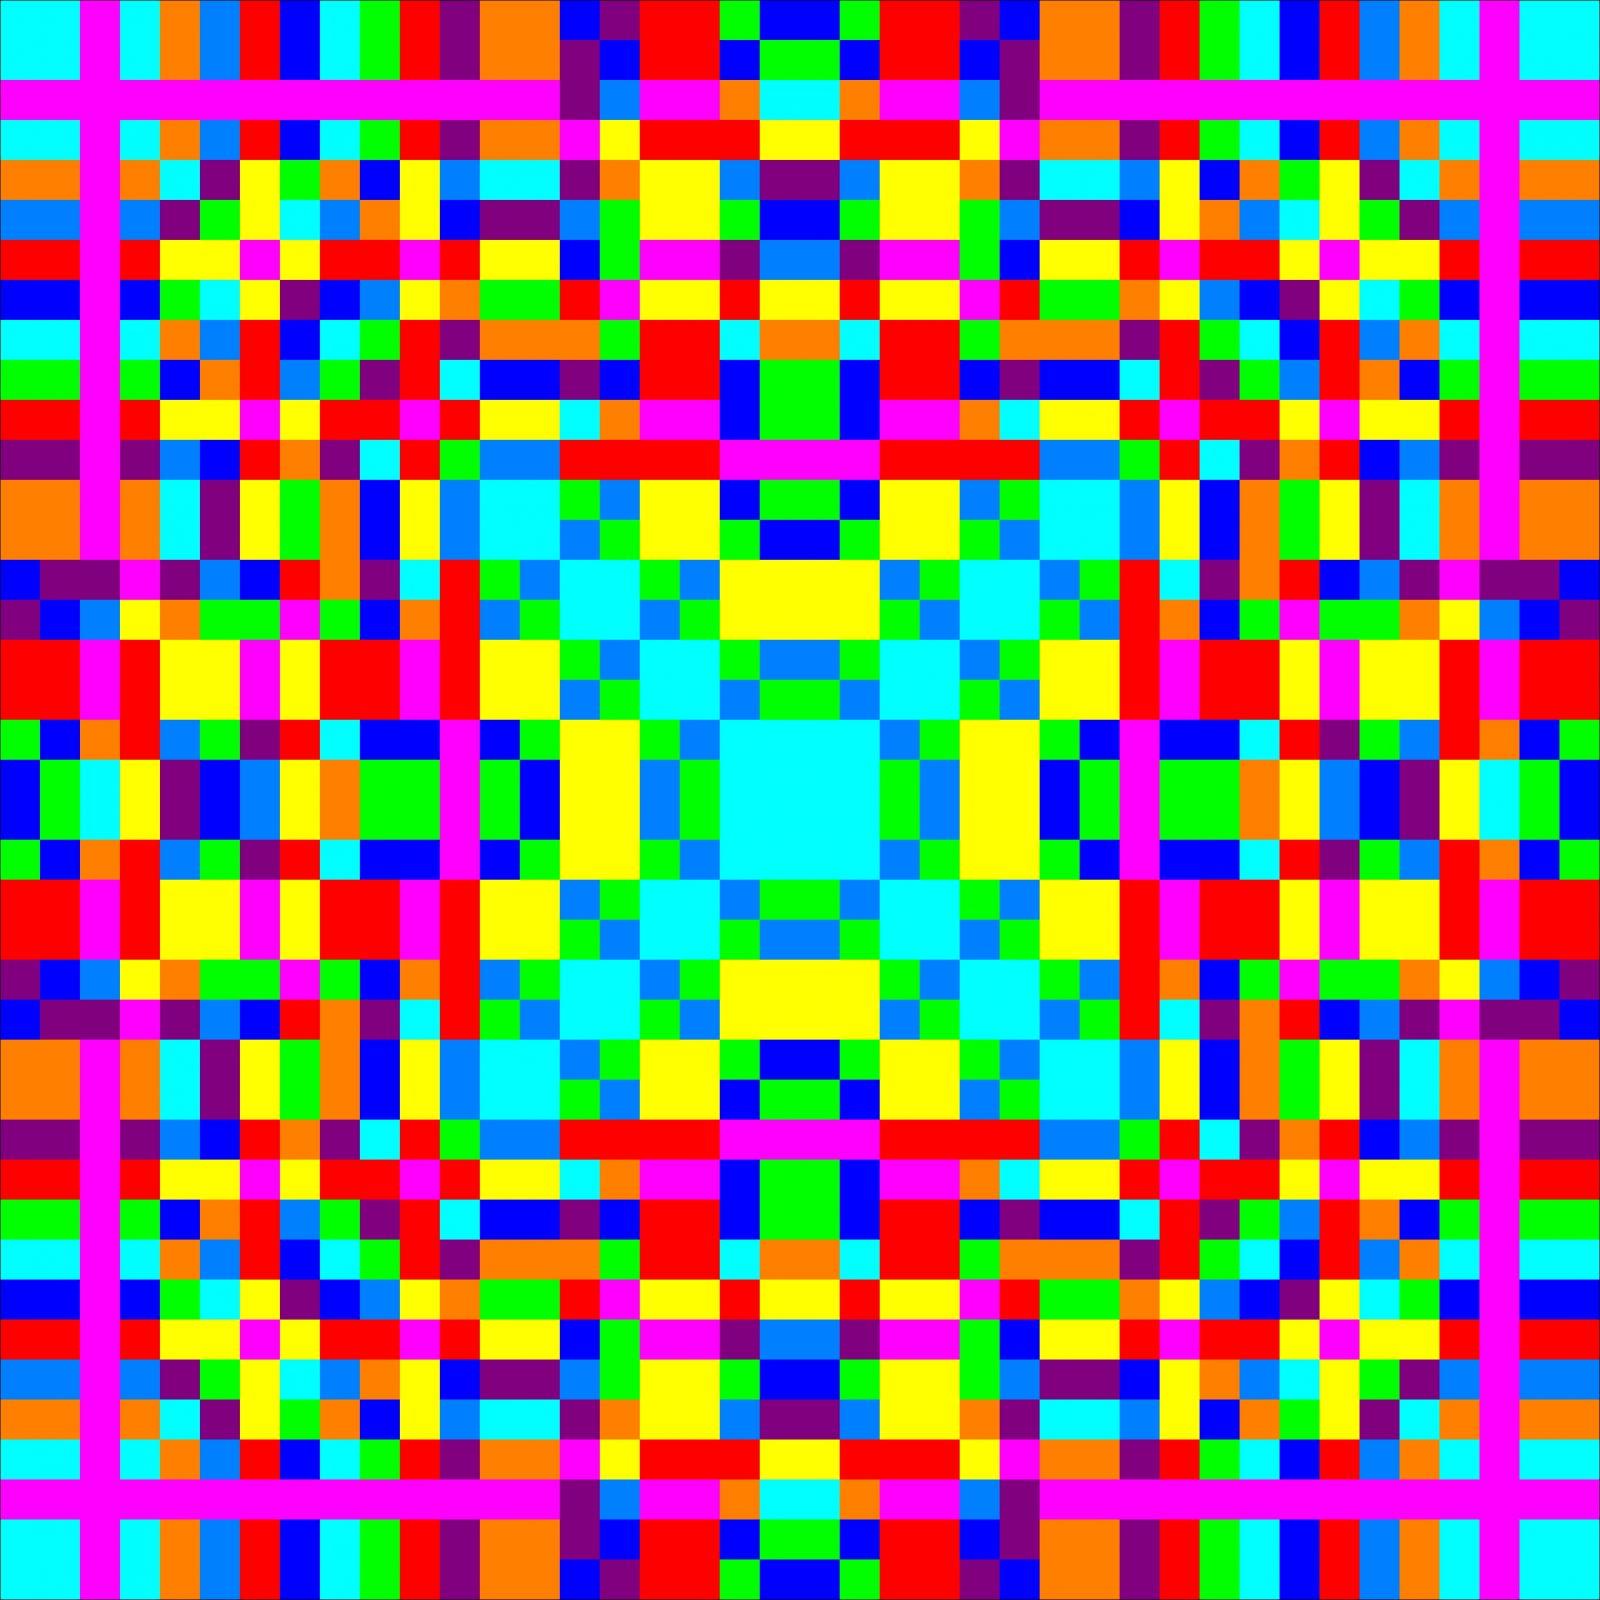 Lightbox — Модуль 3 программы МЕГАкоучинг (Big Picture Video Page)-41